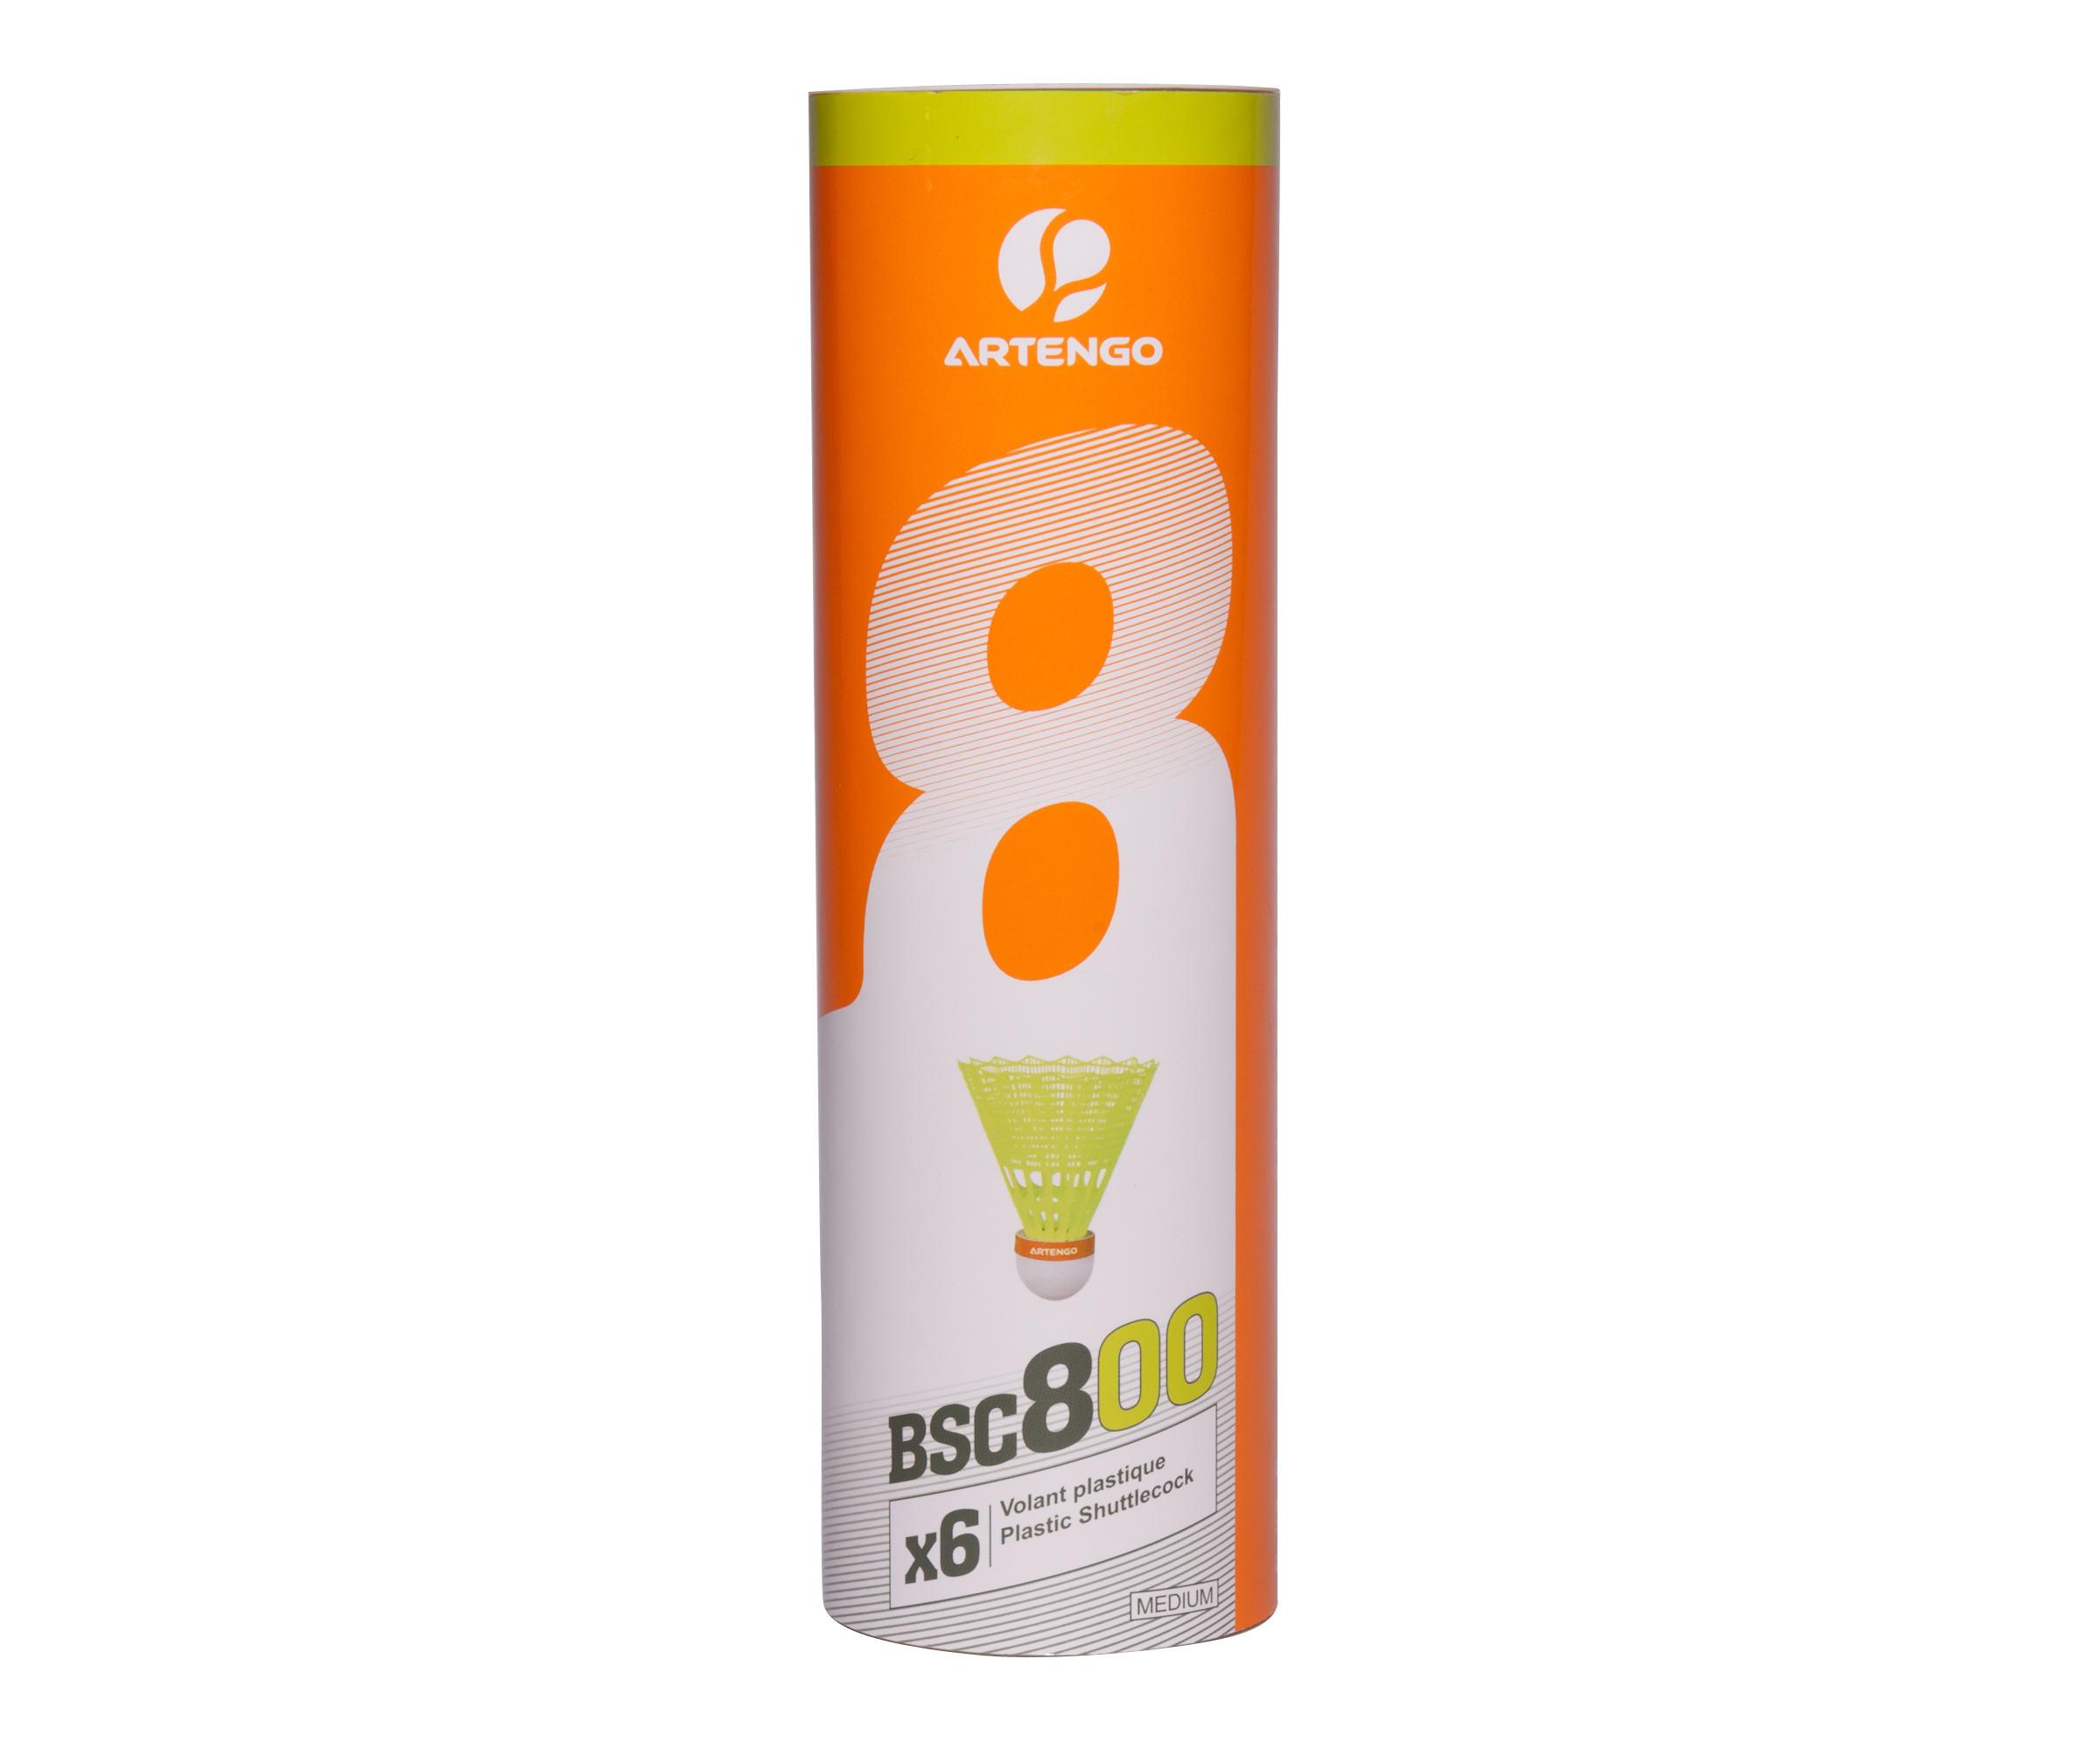 Artengo Badminton shuttle BSC800 6 stuks